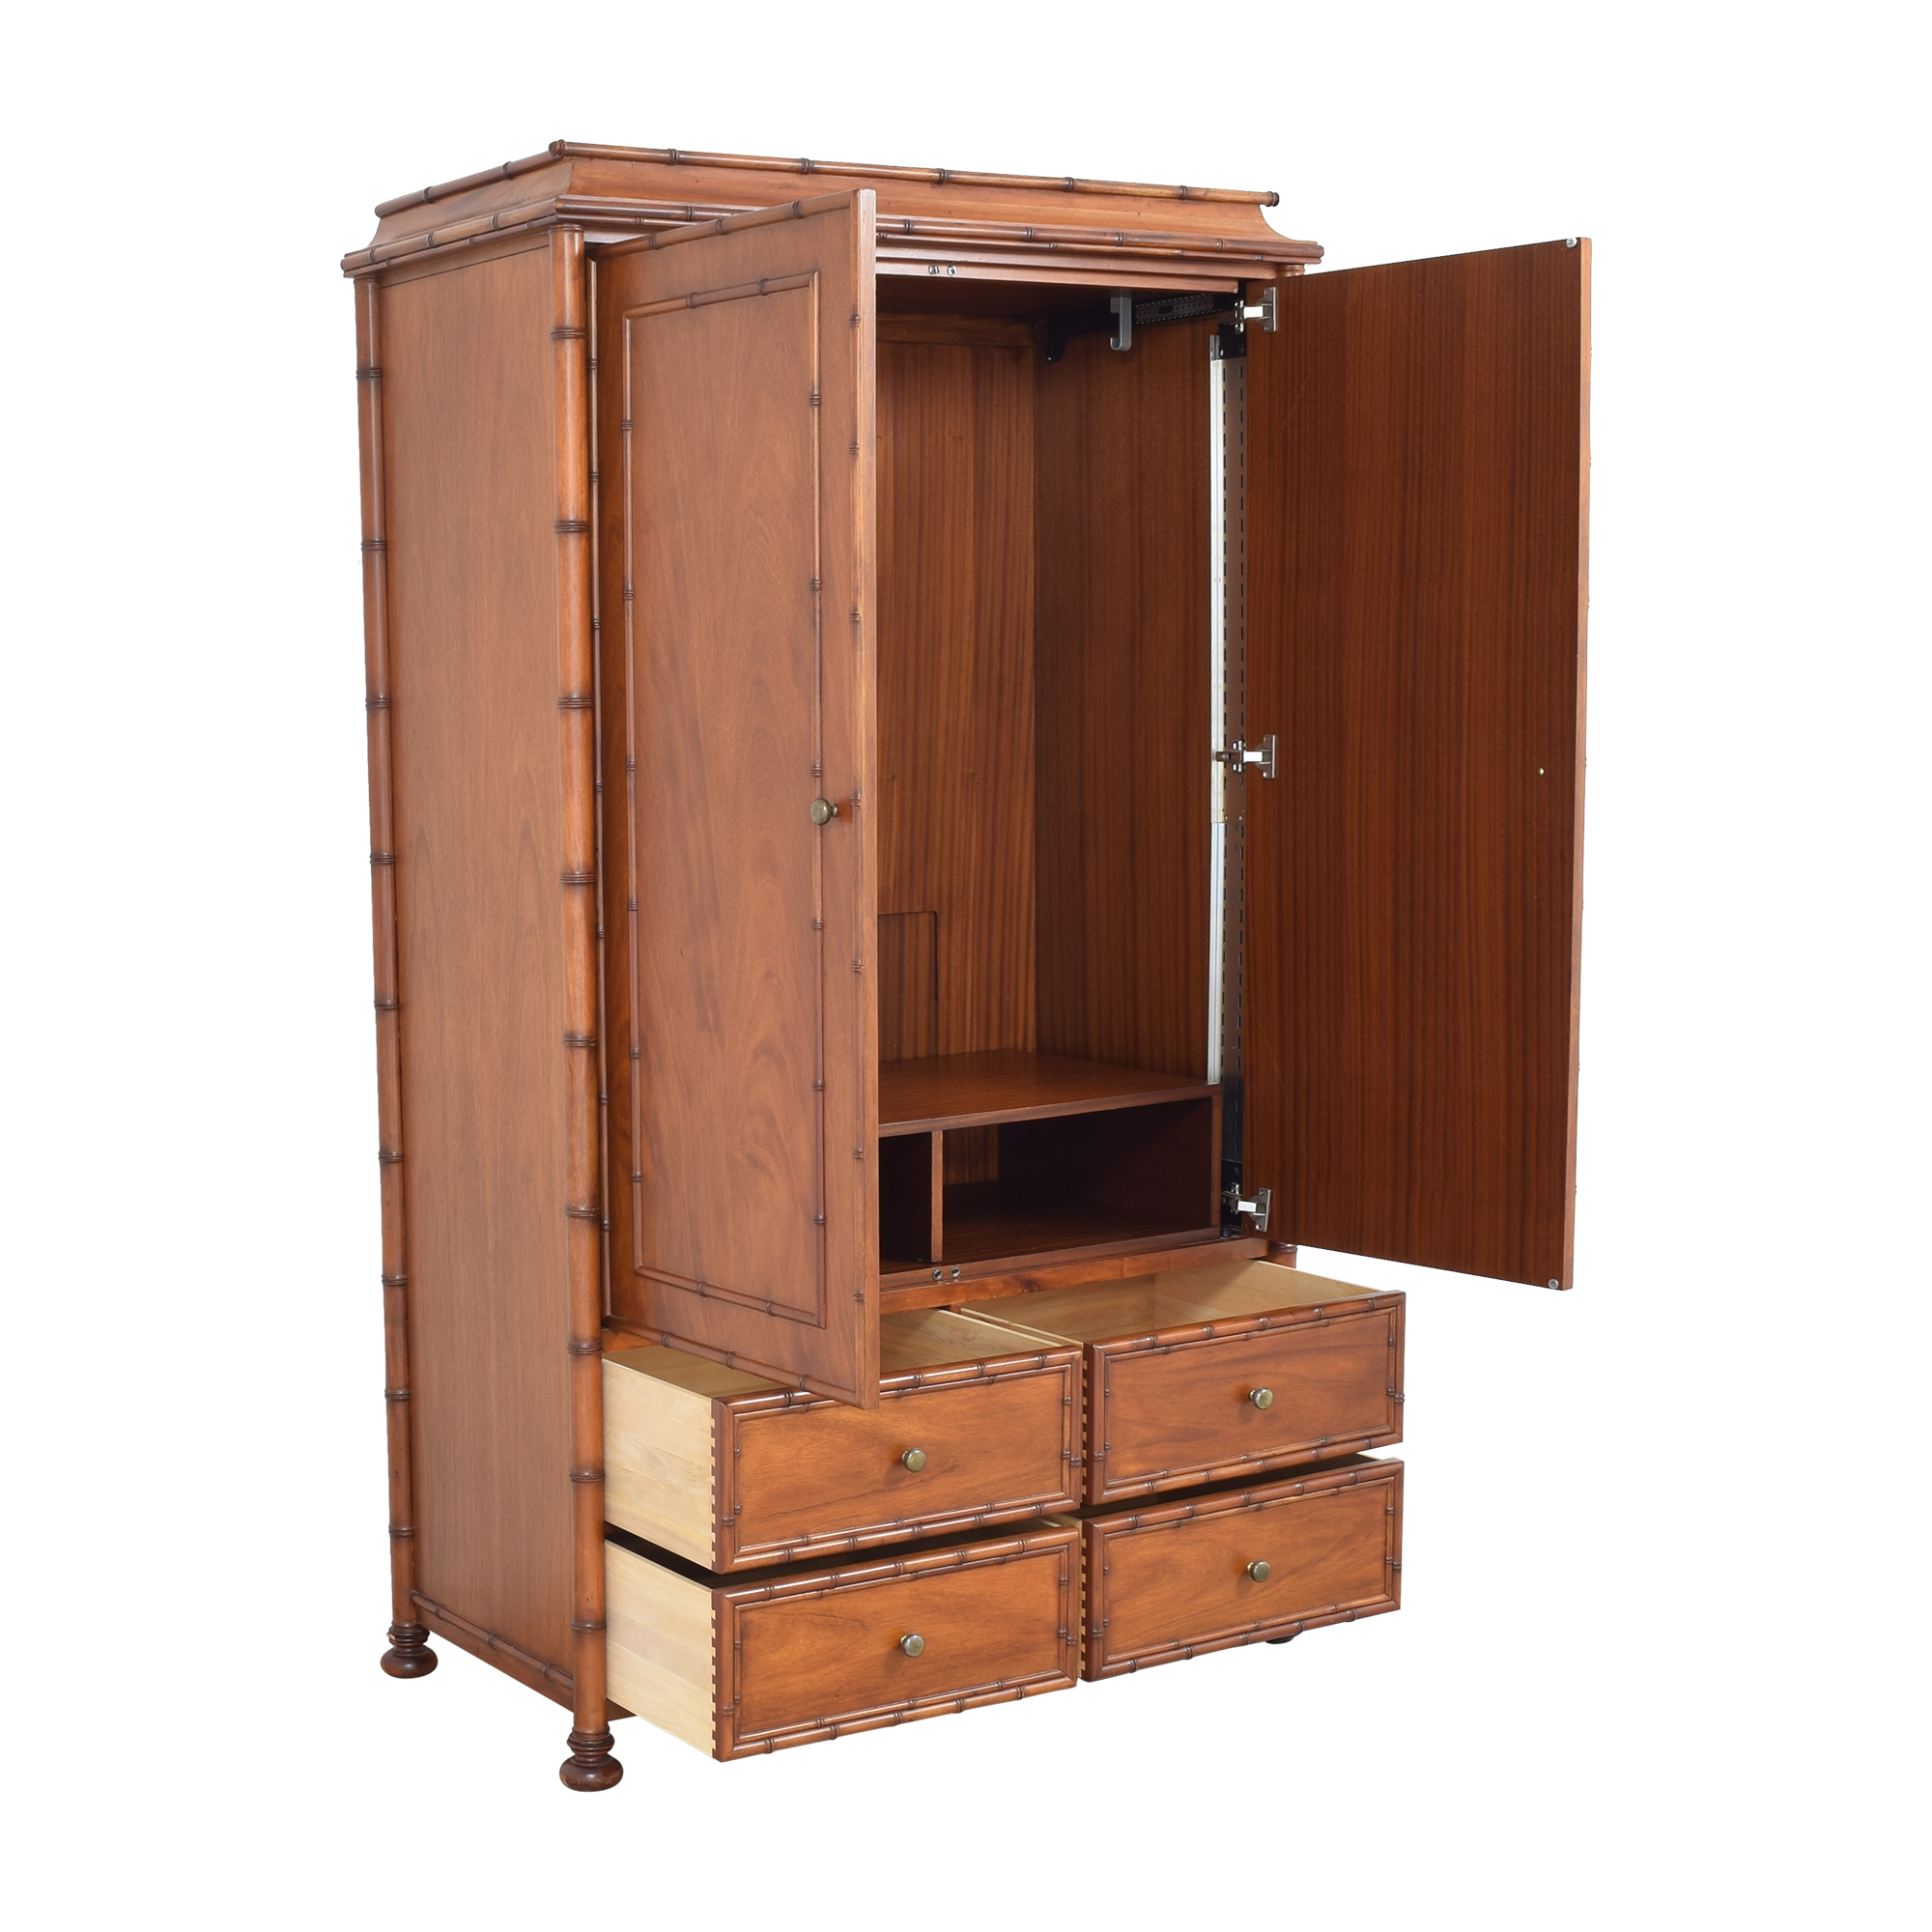 Restoration Hardware Two Door Armoire / Wardrobes & Armoires